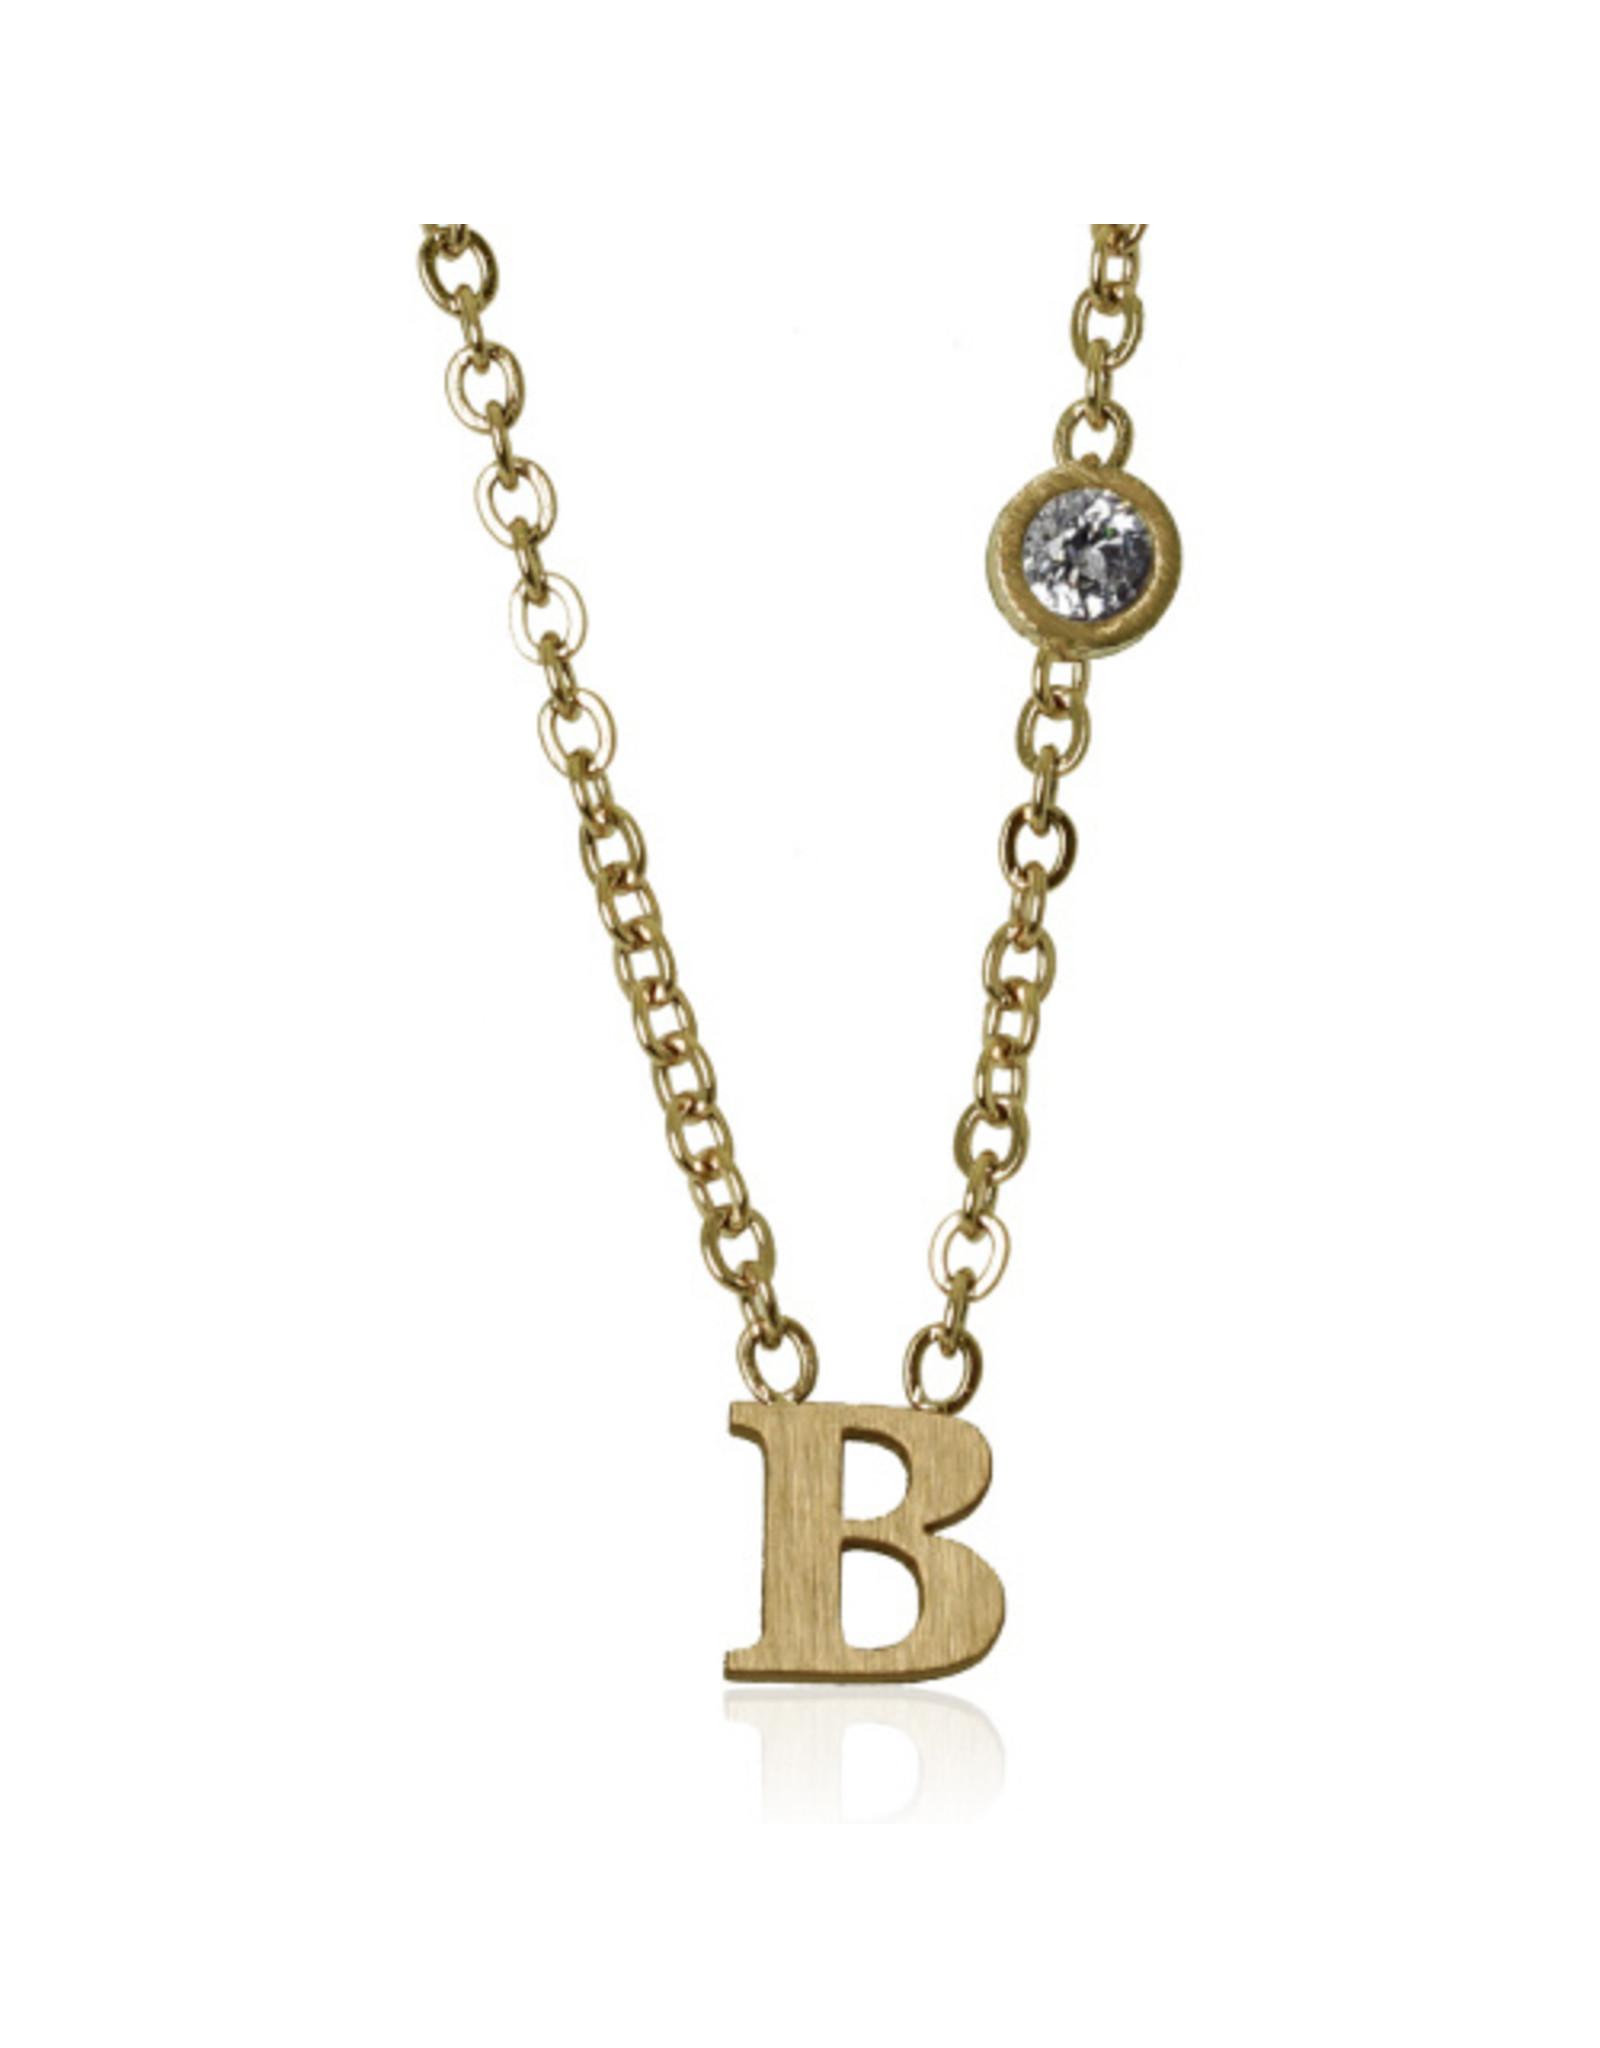 jj + rr  Floating Letter Necklace A to M -